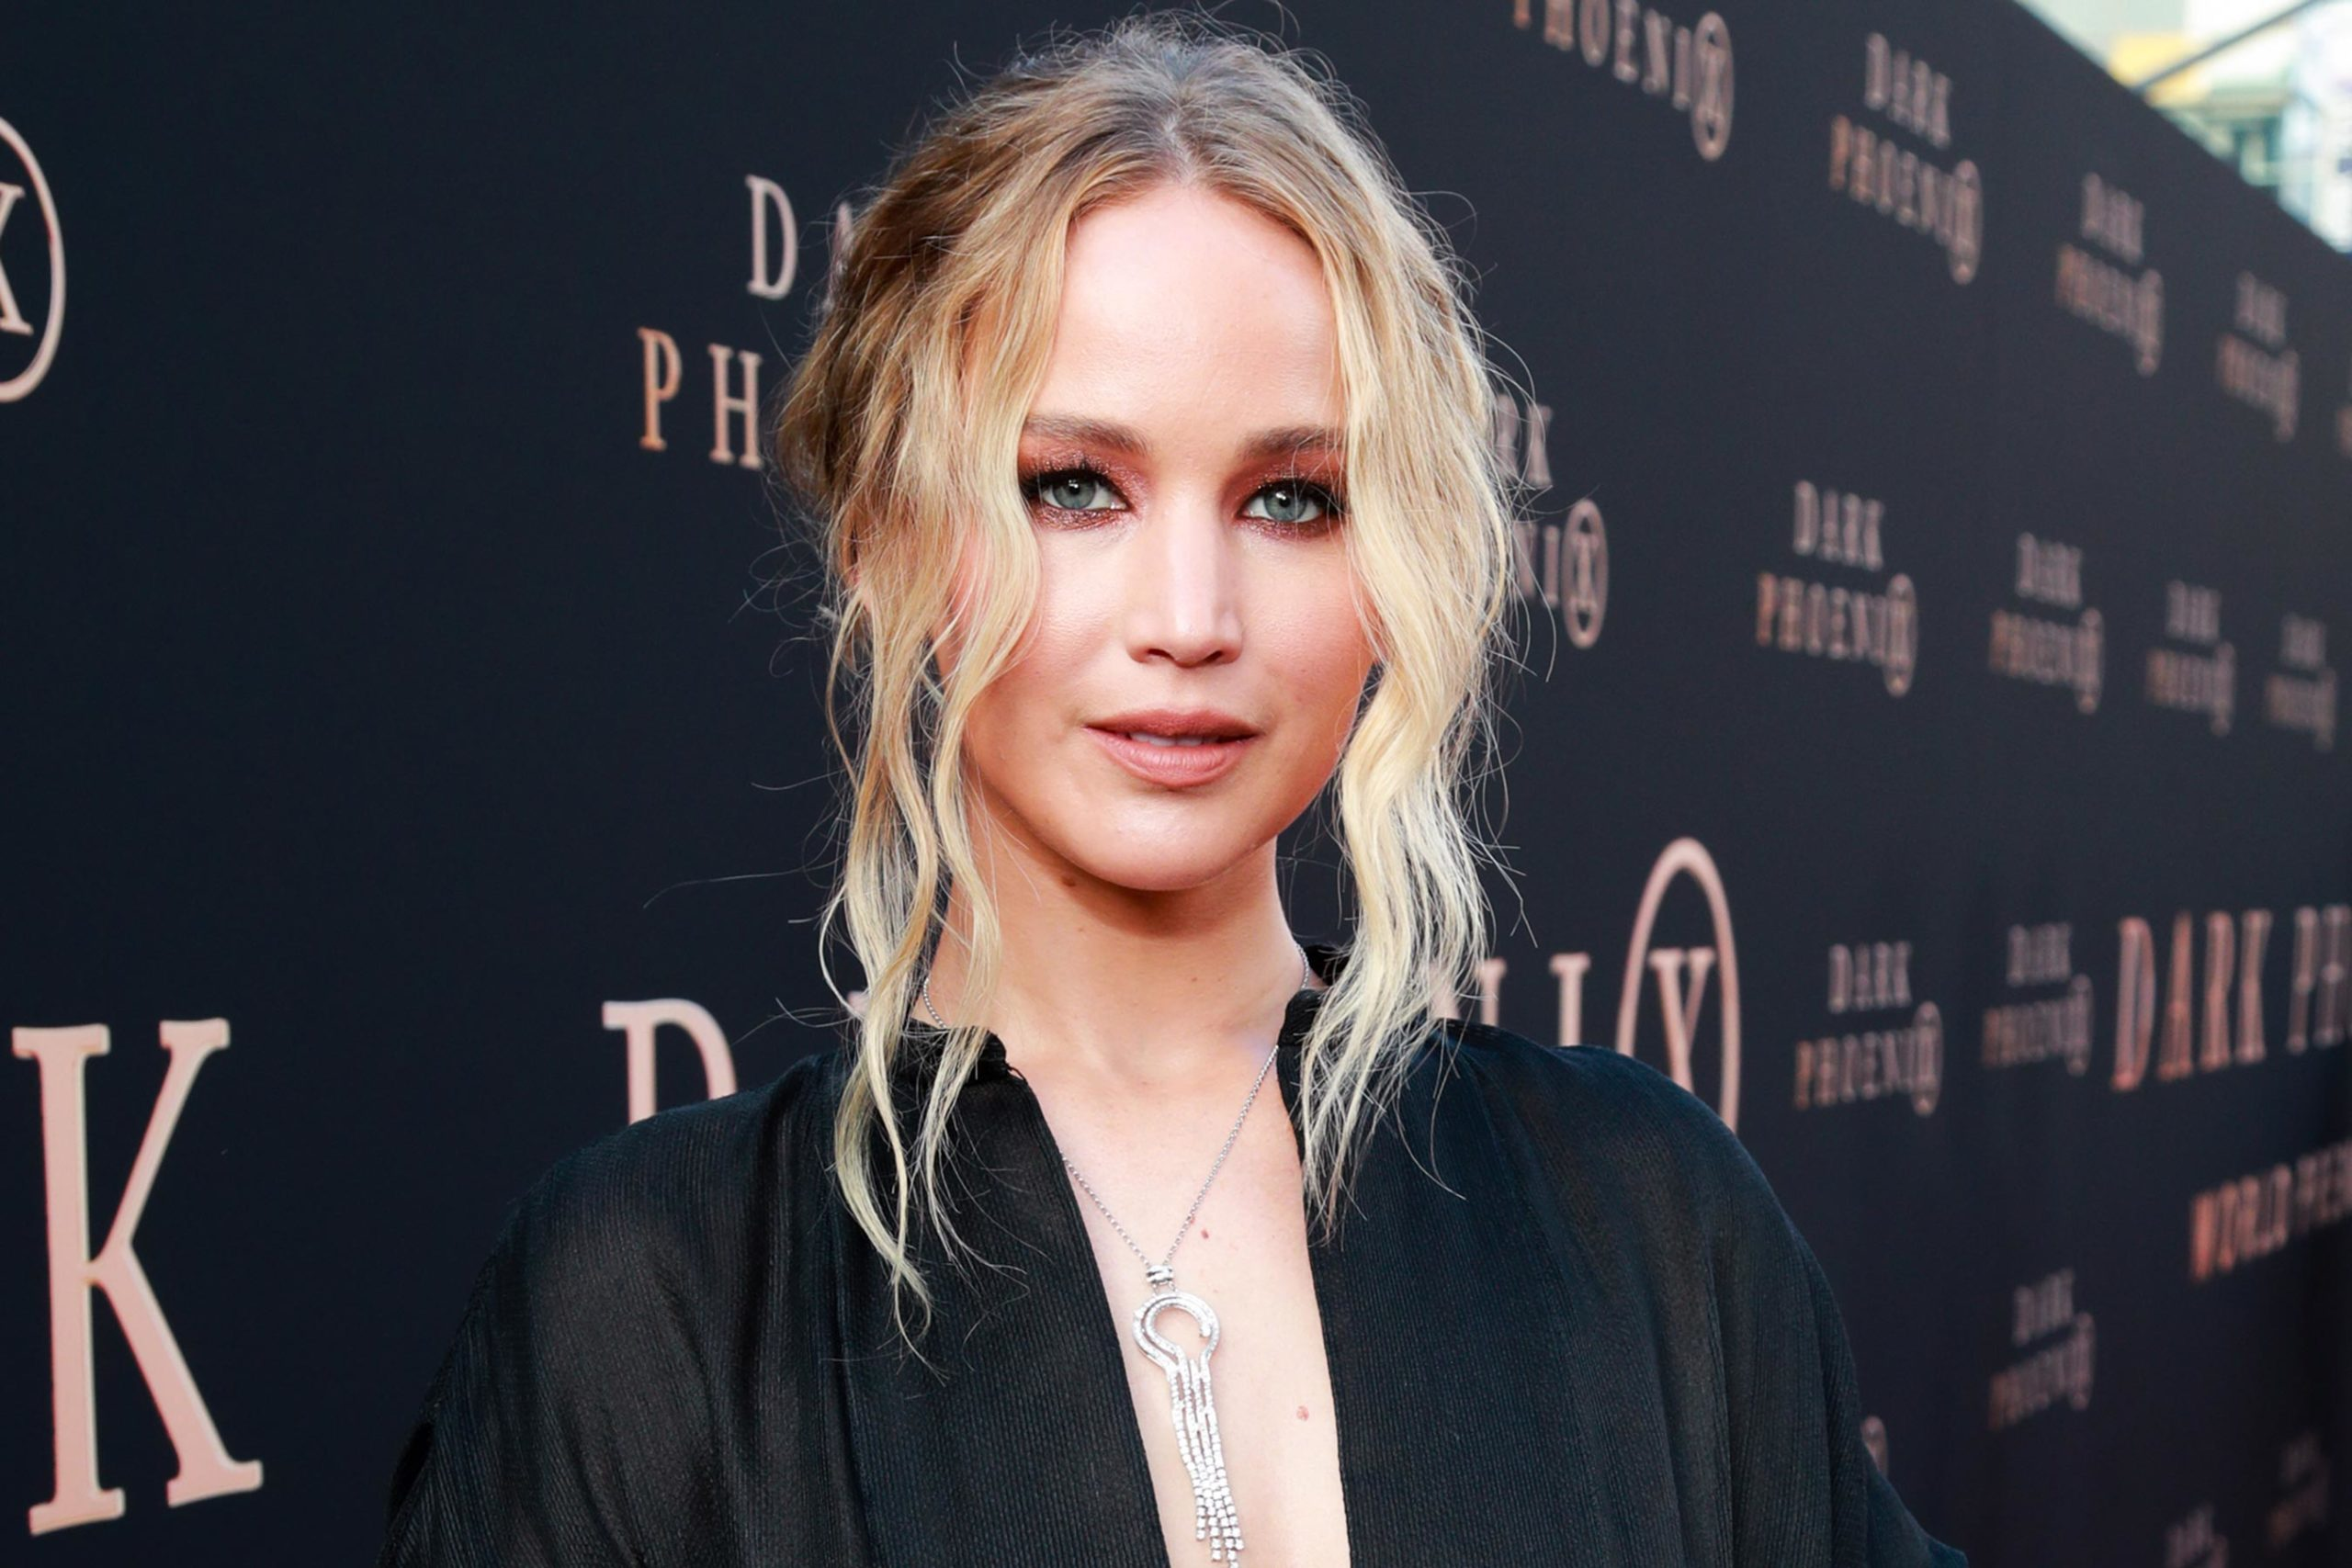 La actriz Jennifer Lawrence y Paolo Sorrentino preparan biopic sobre mafia, Mob Girl